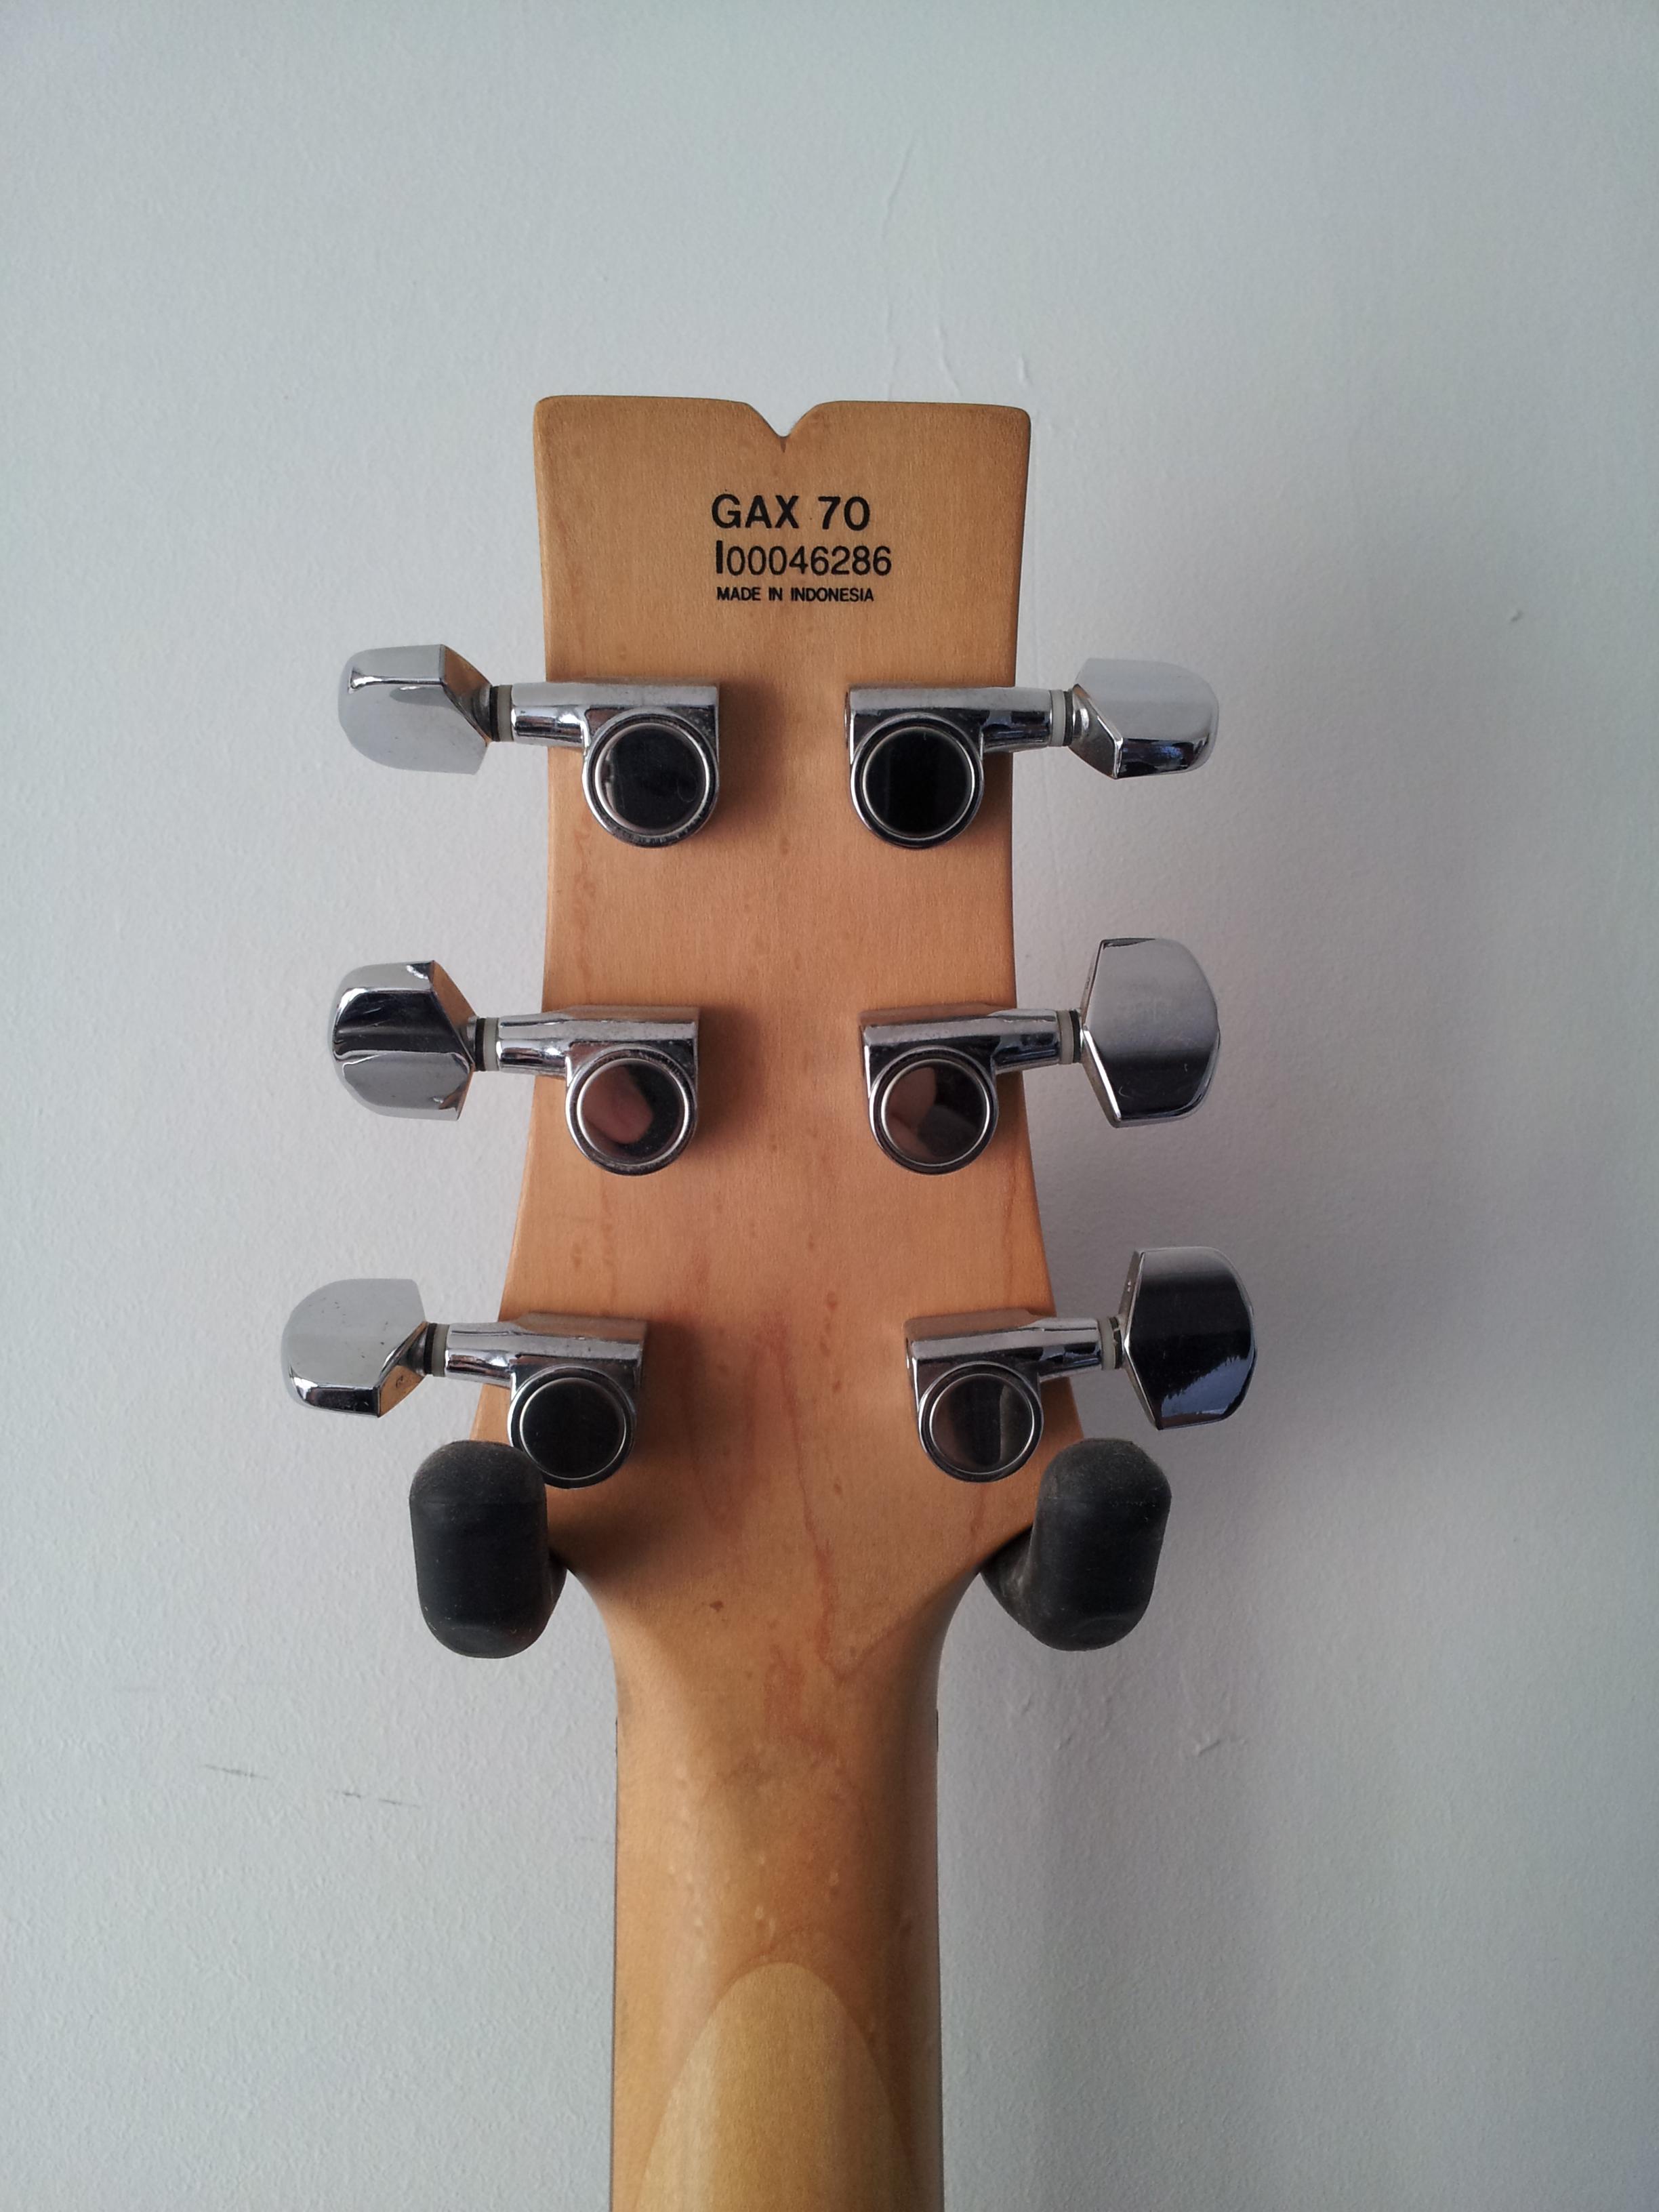 Comfortable Hss Strat Wiring Tall Di Marizo Round Strat Hss Wiring Free Tsb Young Ibanez Gsr100 Bass OrangeSolar Panel Installation Diagram Ibanez GAX70 Image (#594891)   Audiofanzine